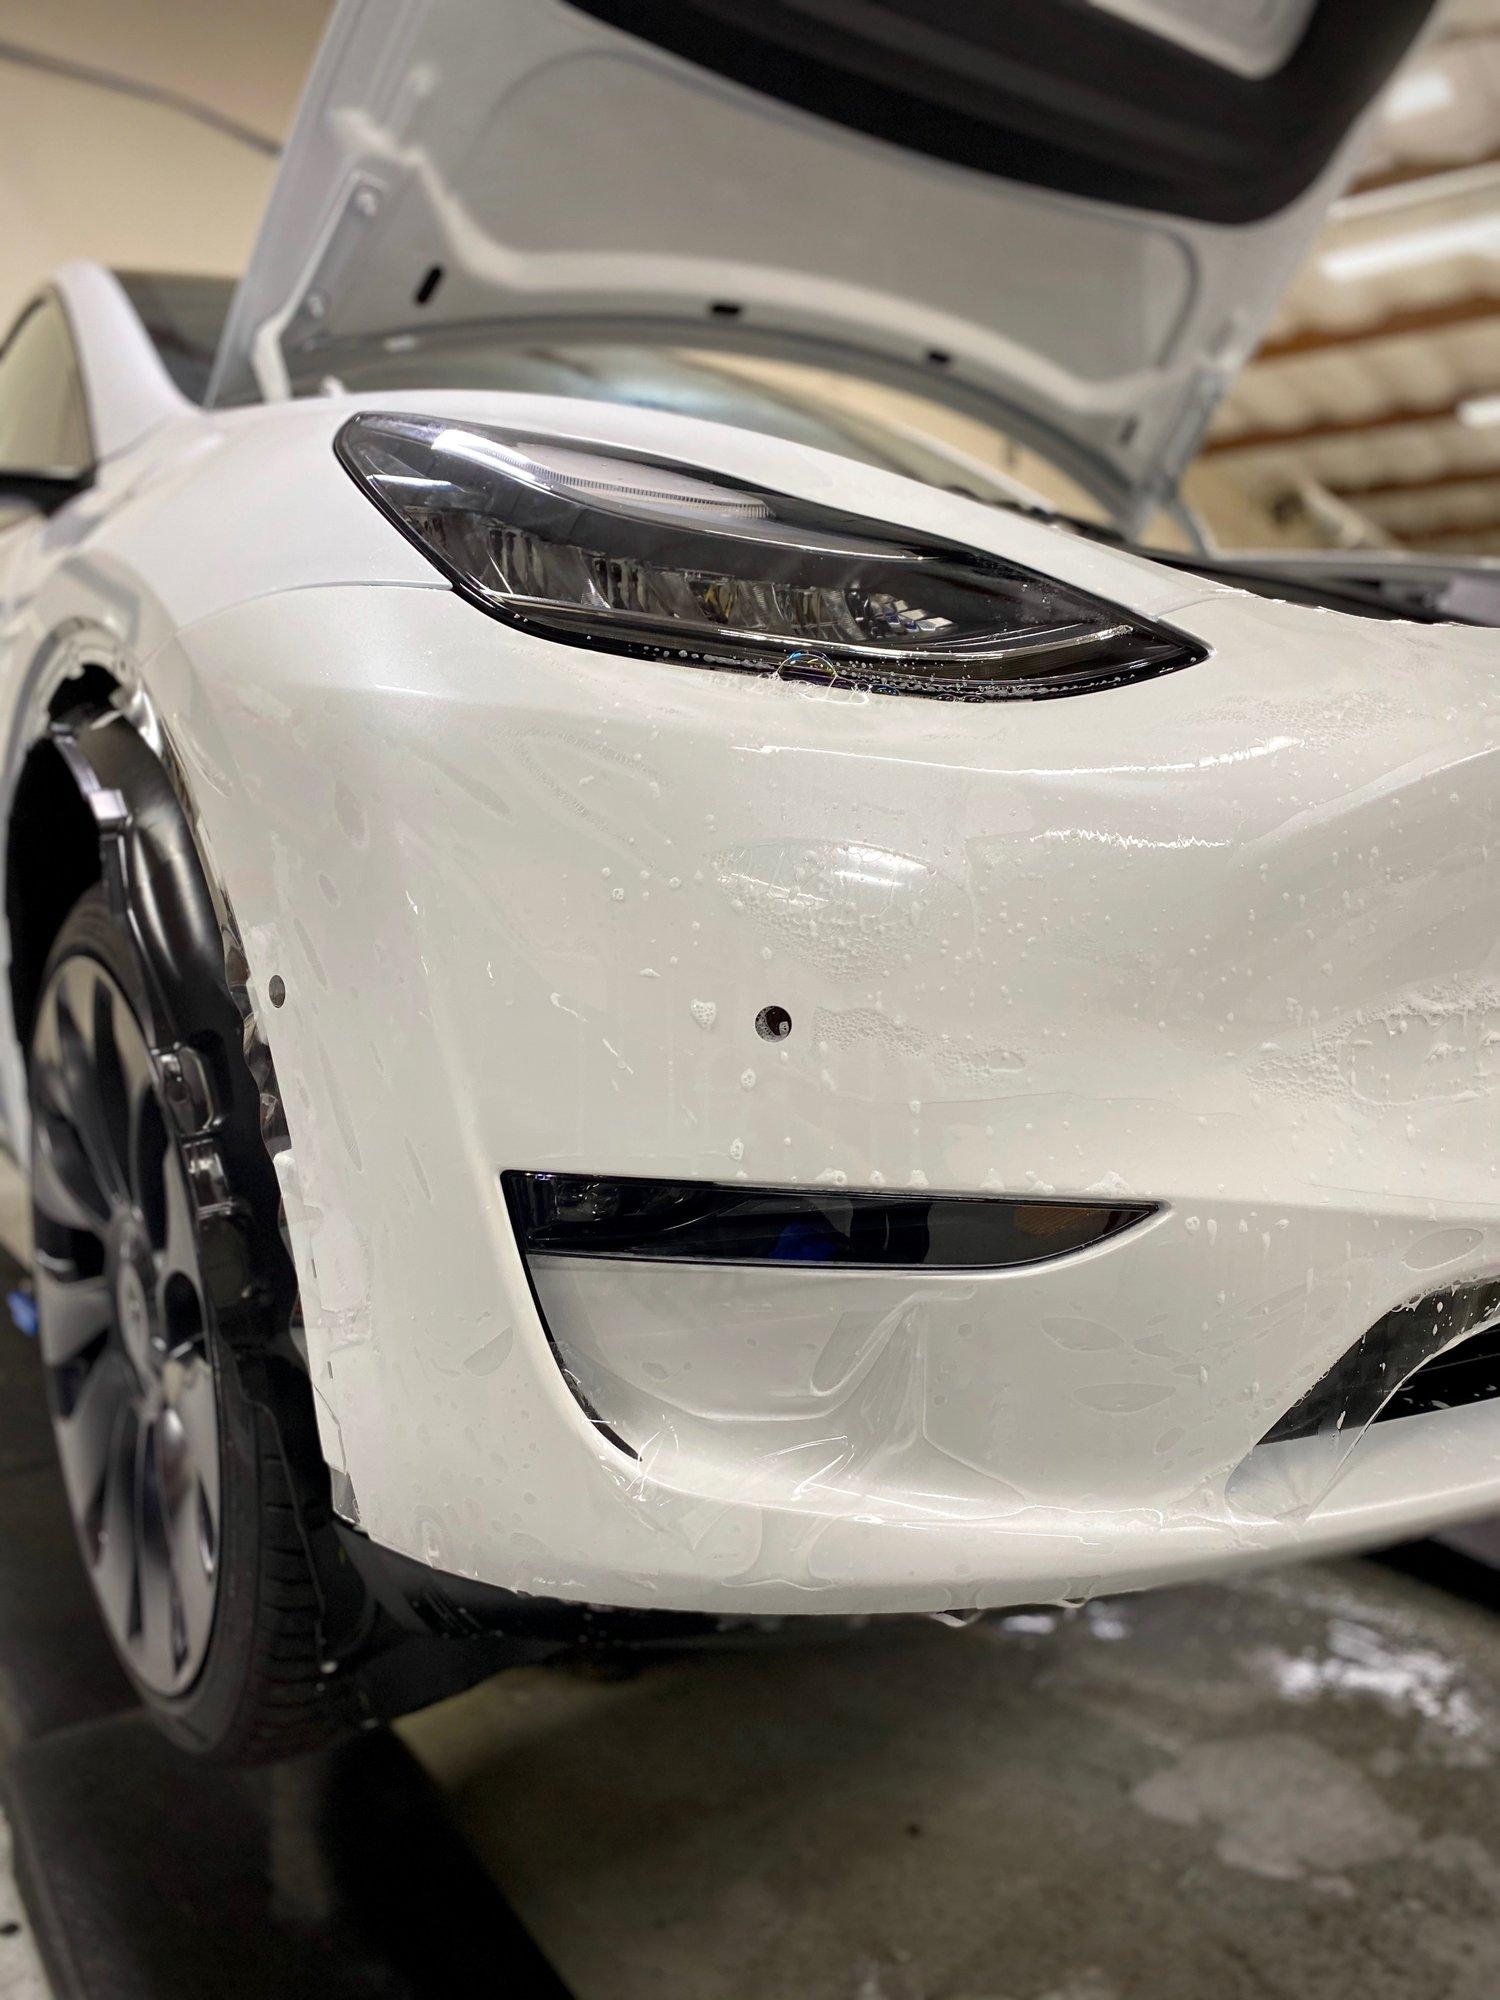 2020 Tesla Model Y Pearl White Multi-Coat  (Appearance Solutions-Sacramento,CA)~15.JPG